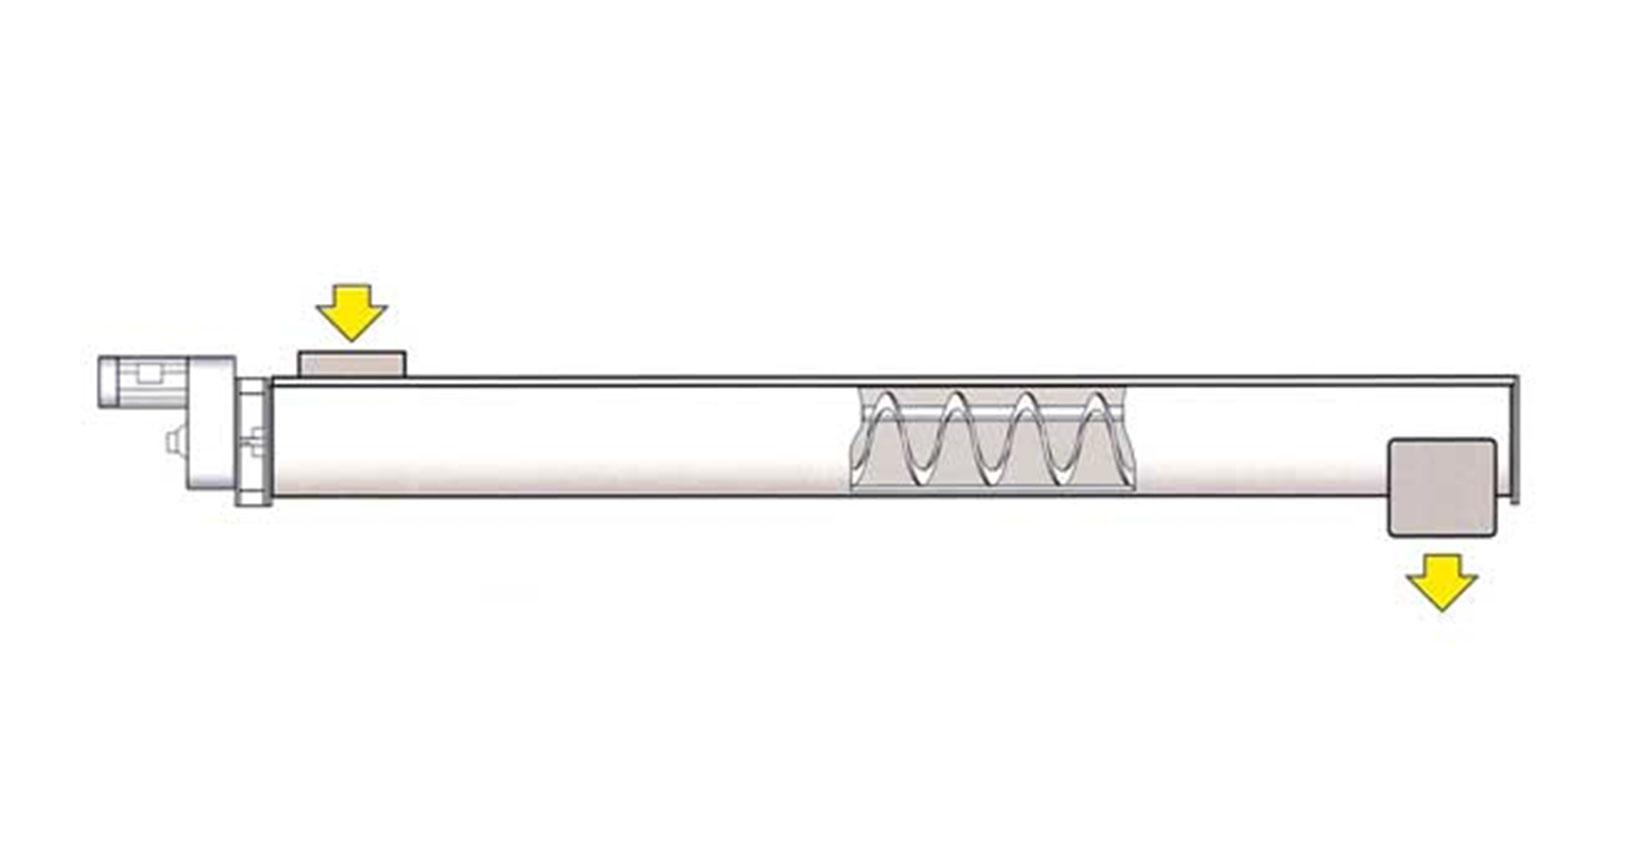 kd02-komponent